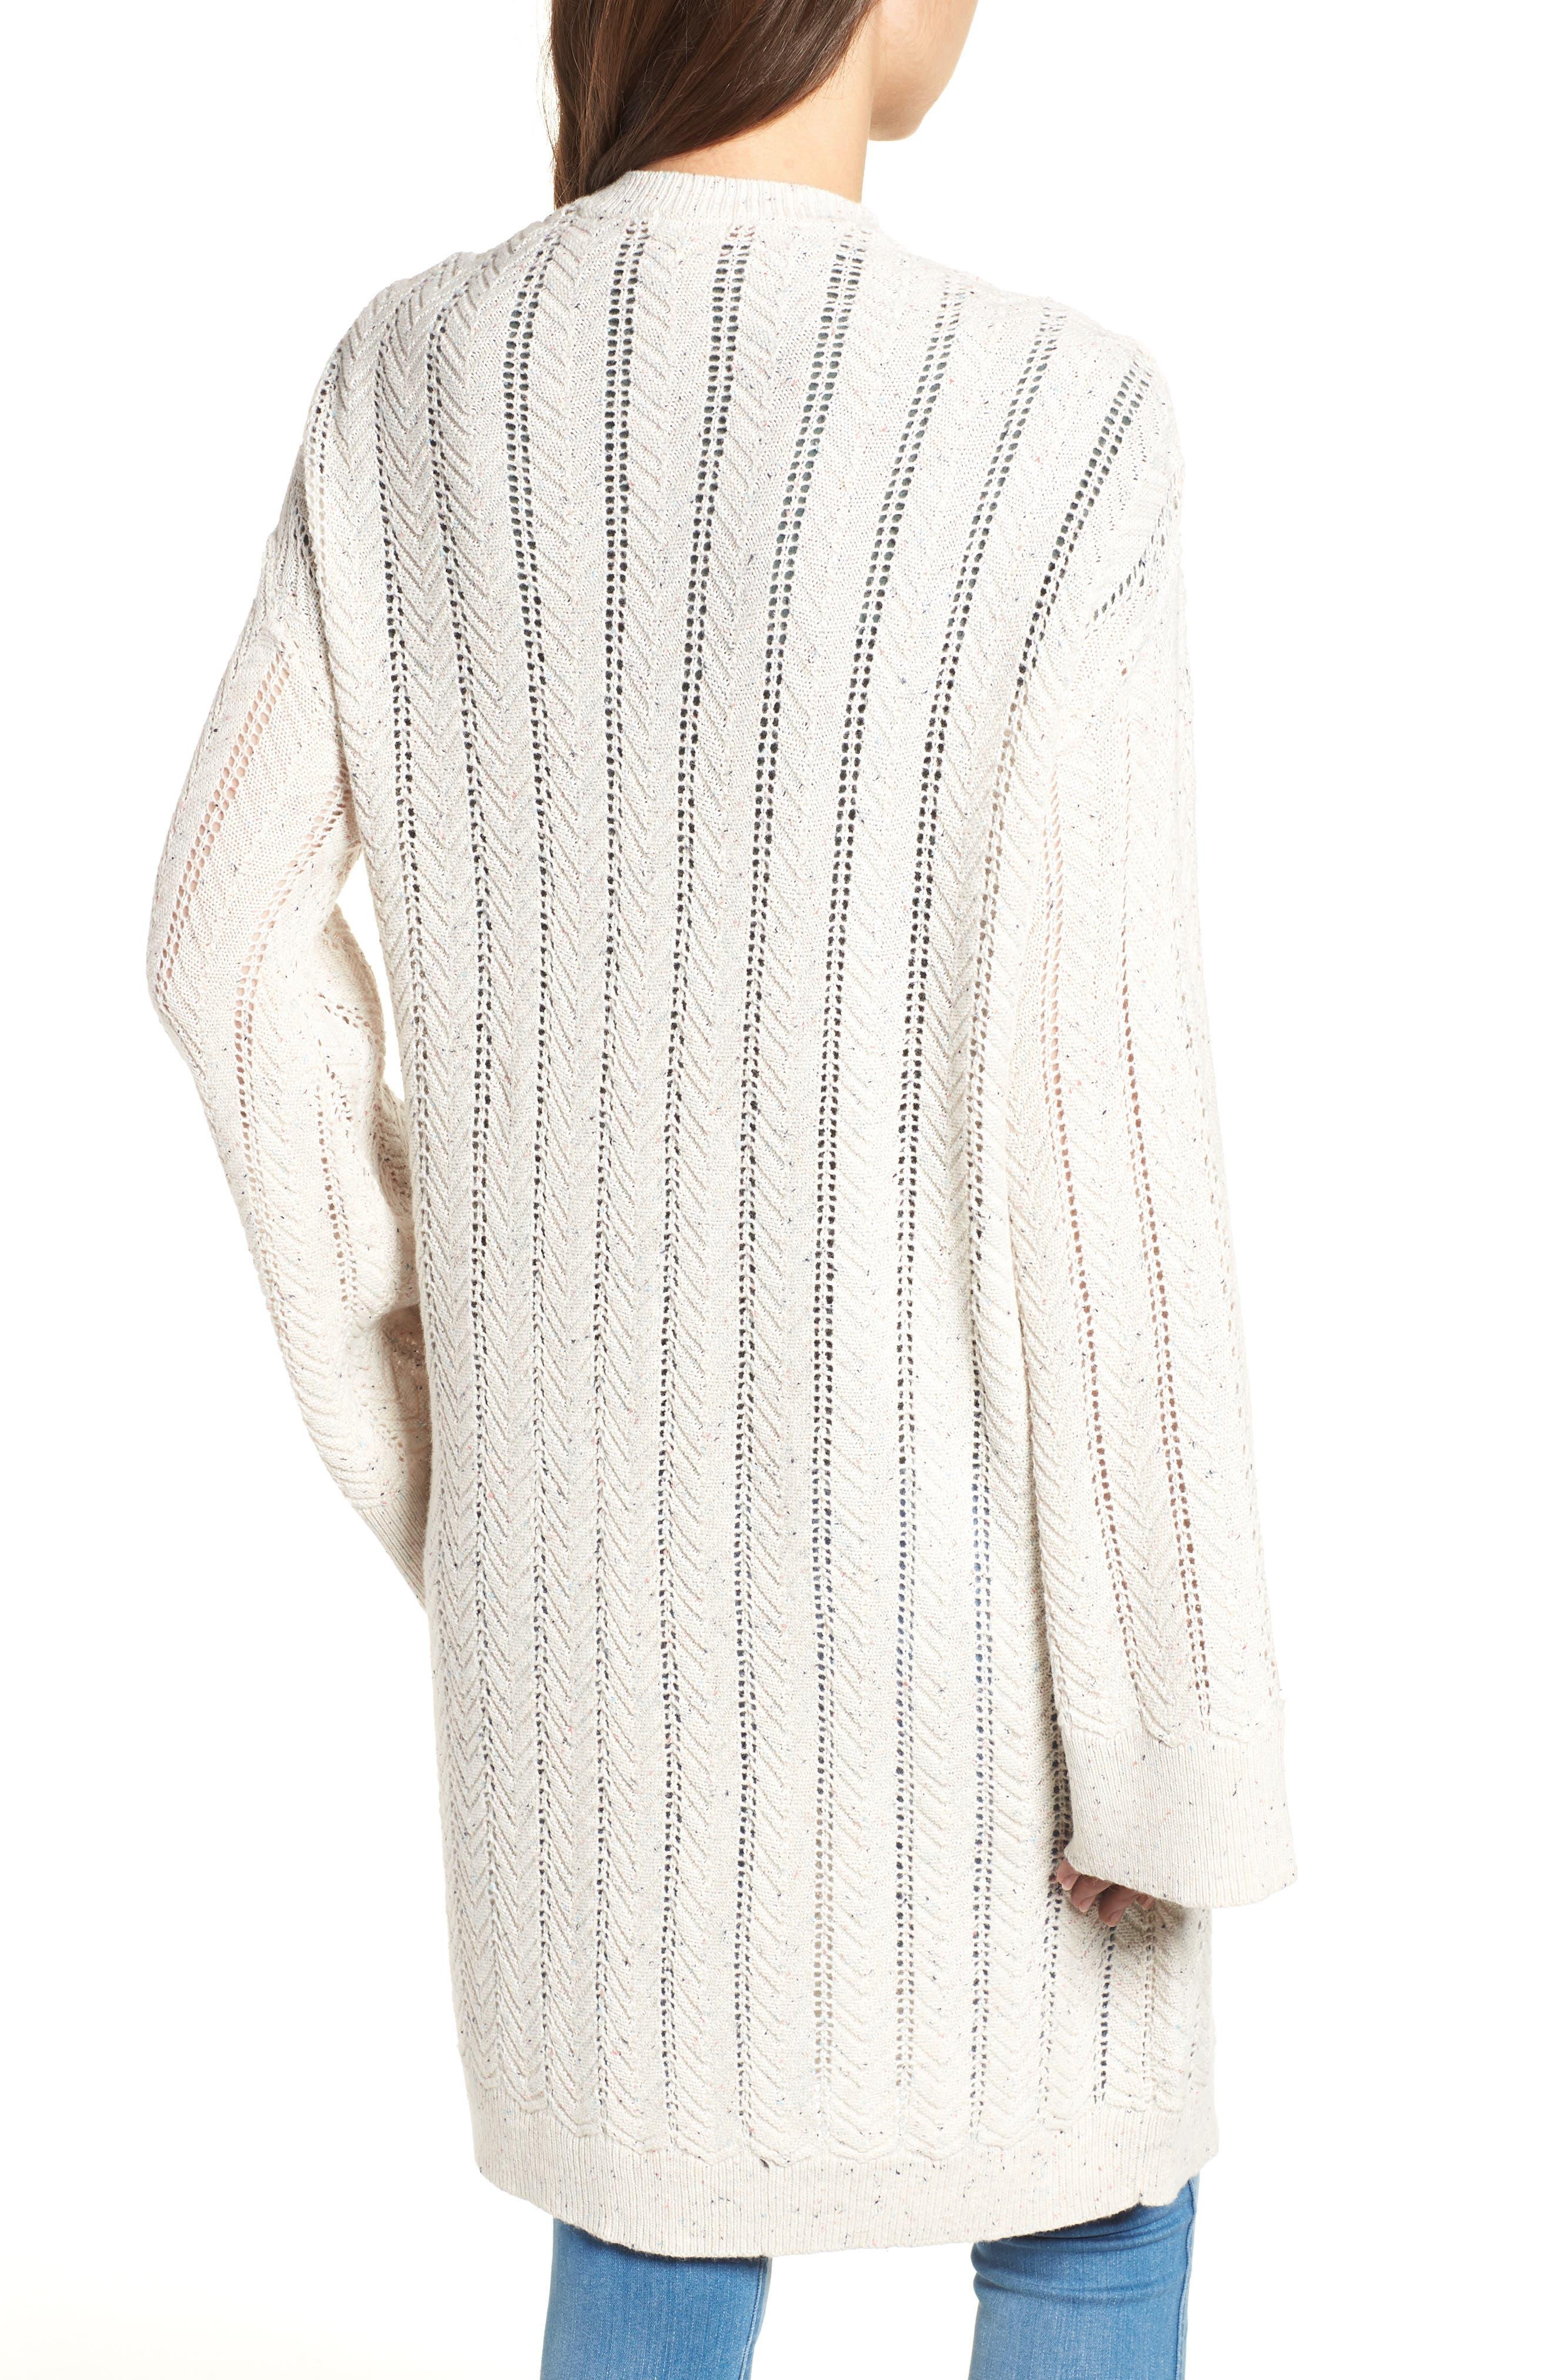 Long Tweed Herringbone Stitch Cardigan,                             Alternate thumbnail 2, color,                             Beige Oatmeal Heather